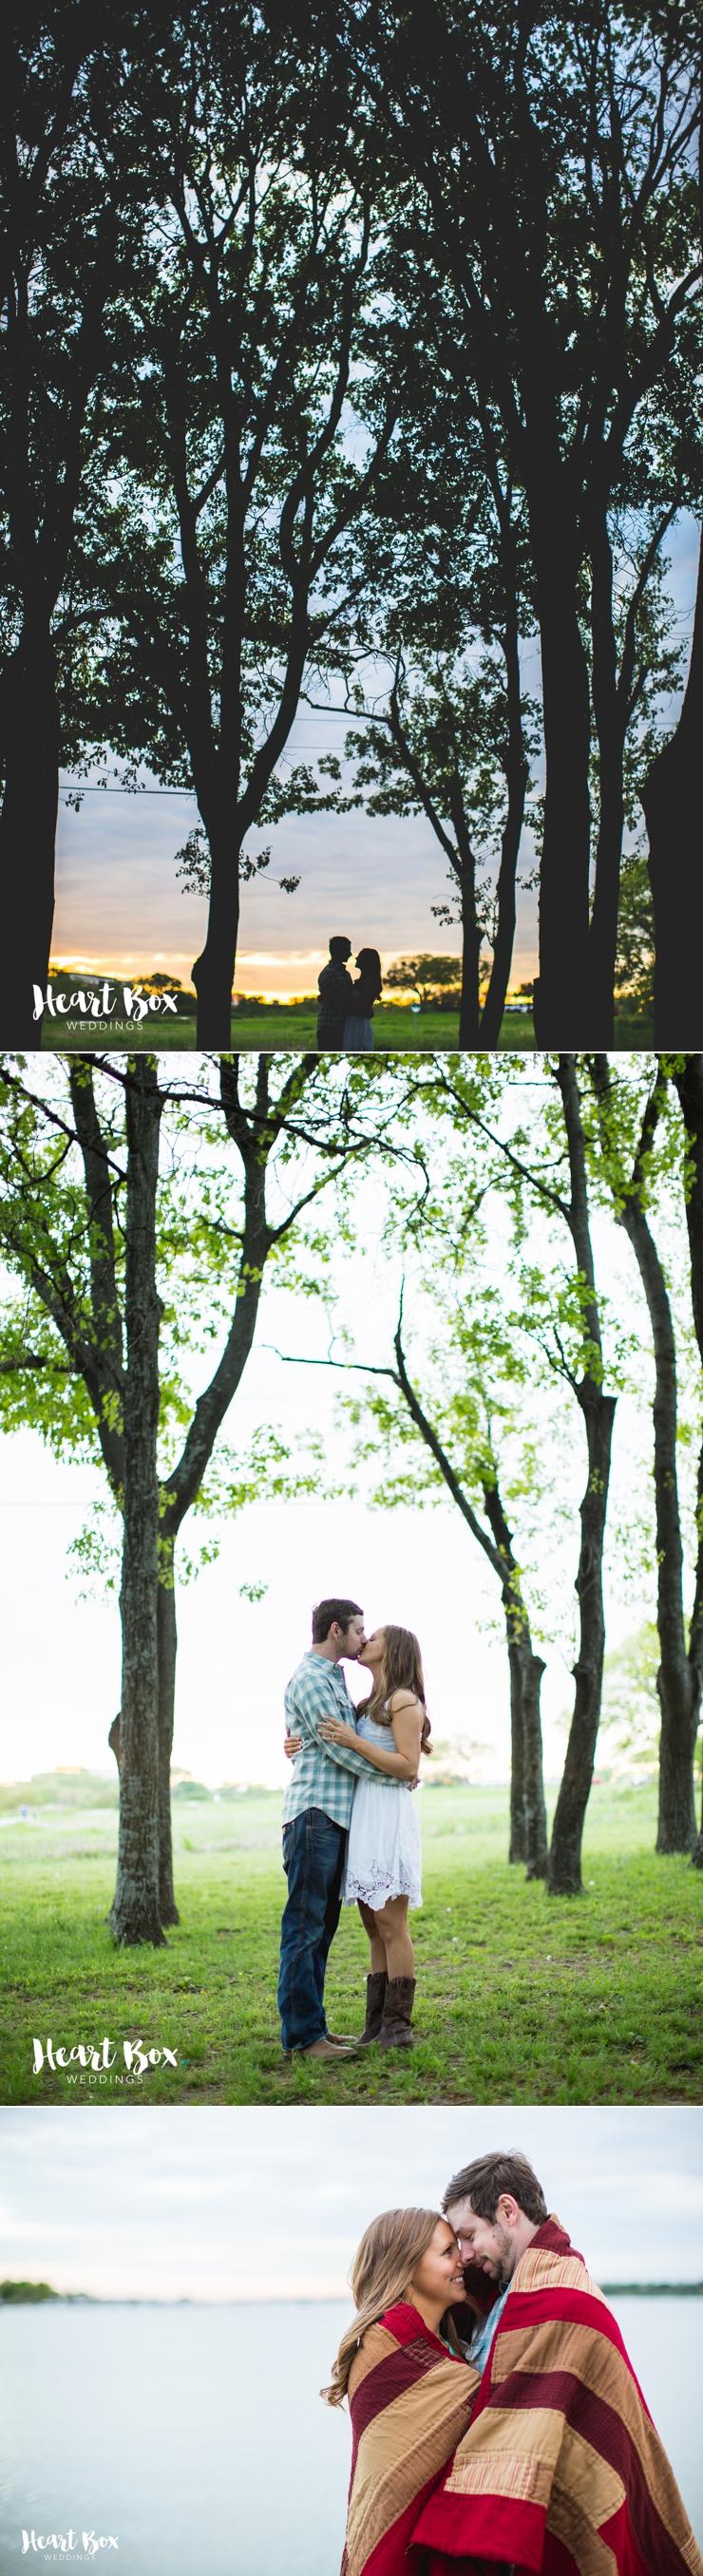 Allison + Matt Engagement Blog Collages 5.jpg